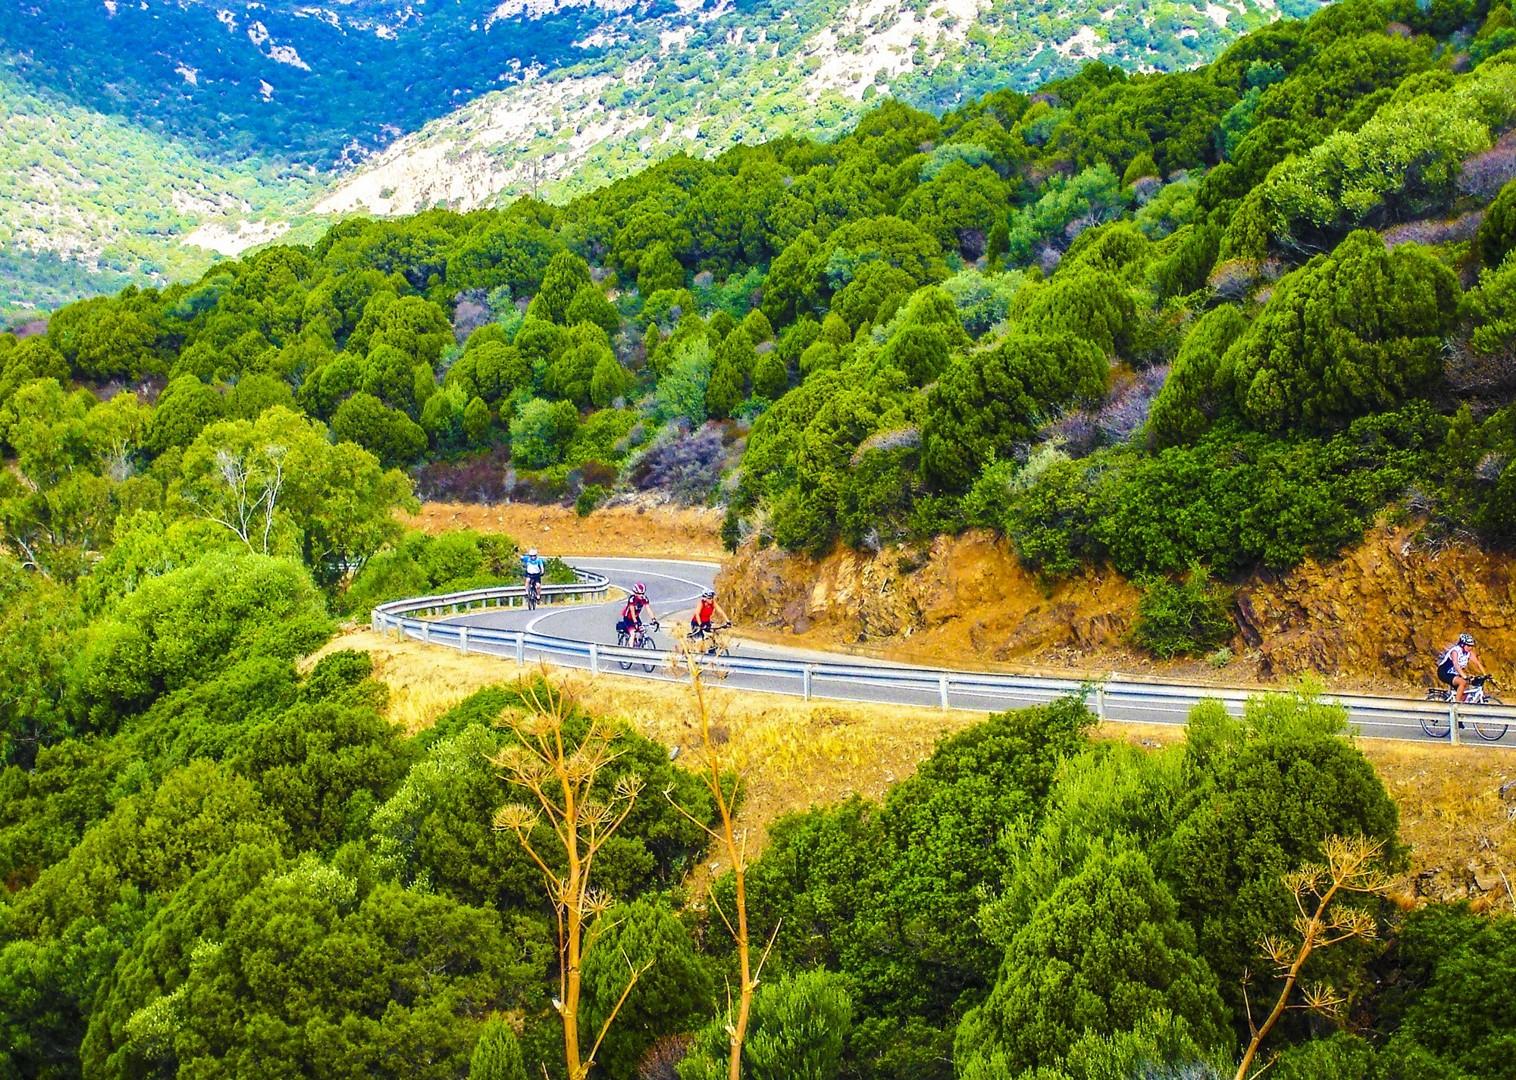 sardinia-italy-self-guided-cycling-holiday.jpg - Italy - Sardinia - Island Flavours - Self-Guided Leisure Cycling Holiday - Italia Leisure and Family Cycling